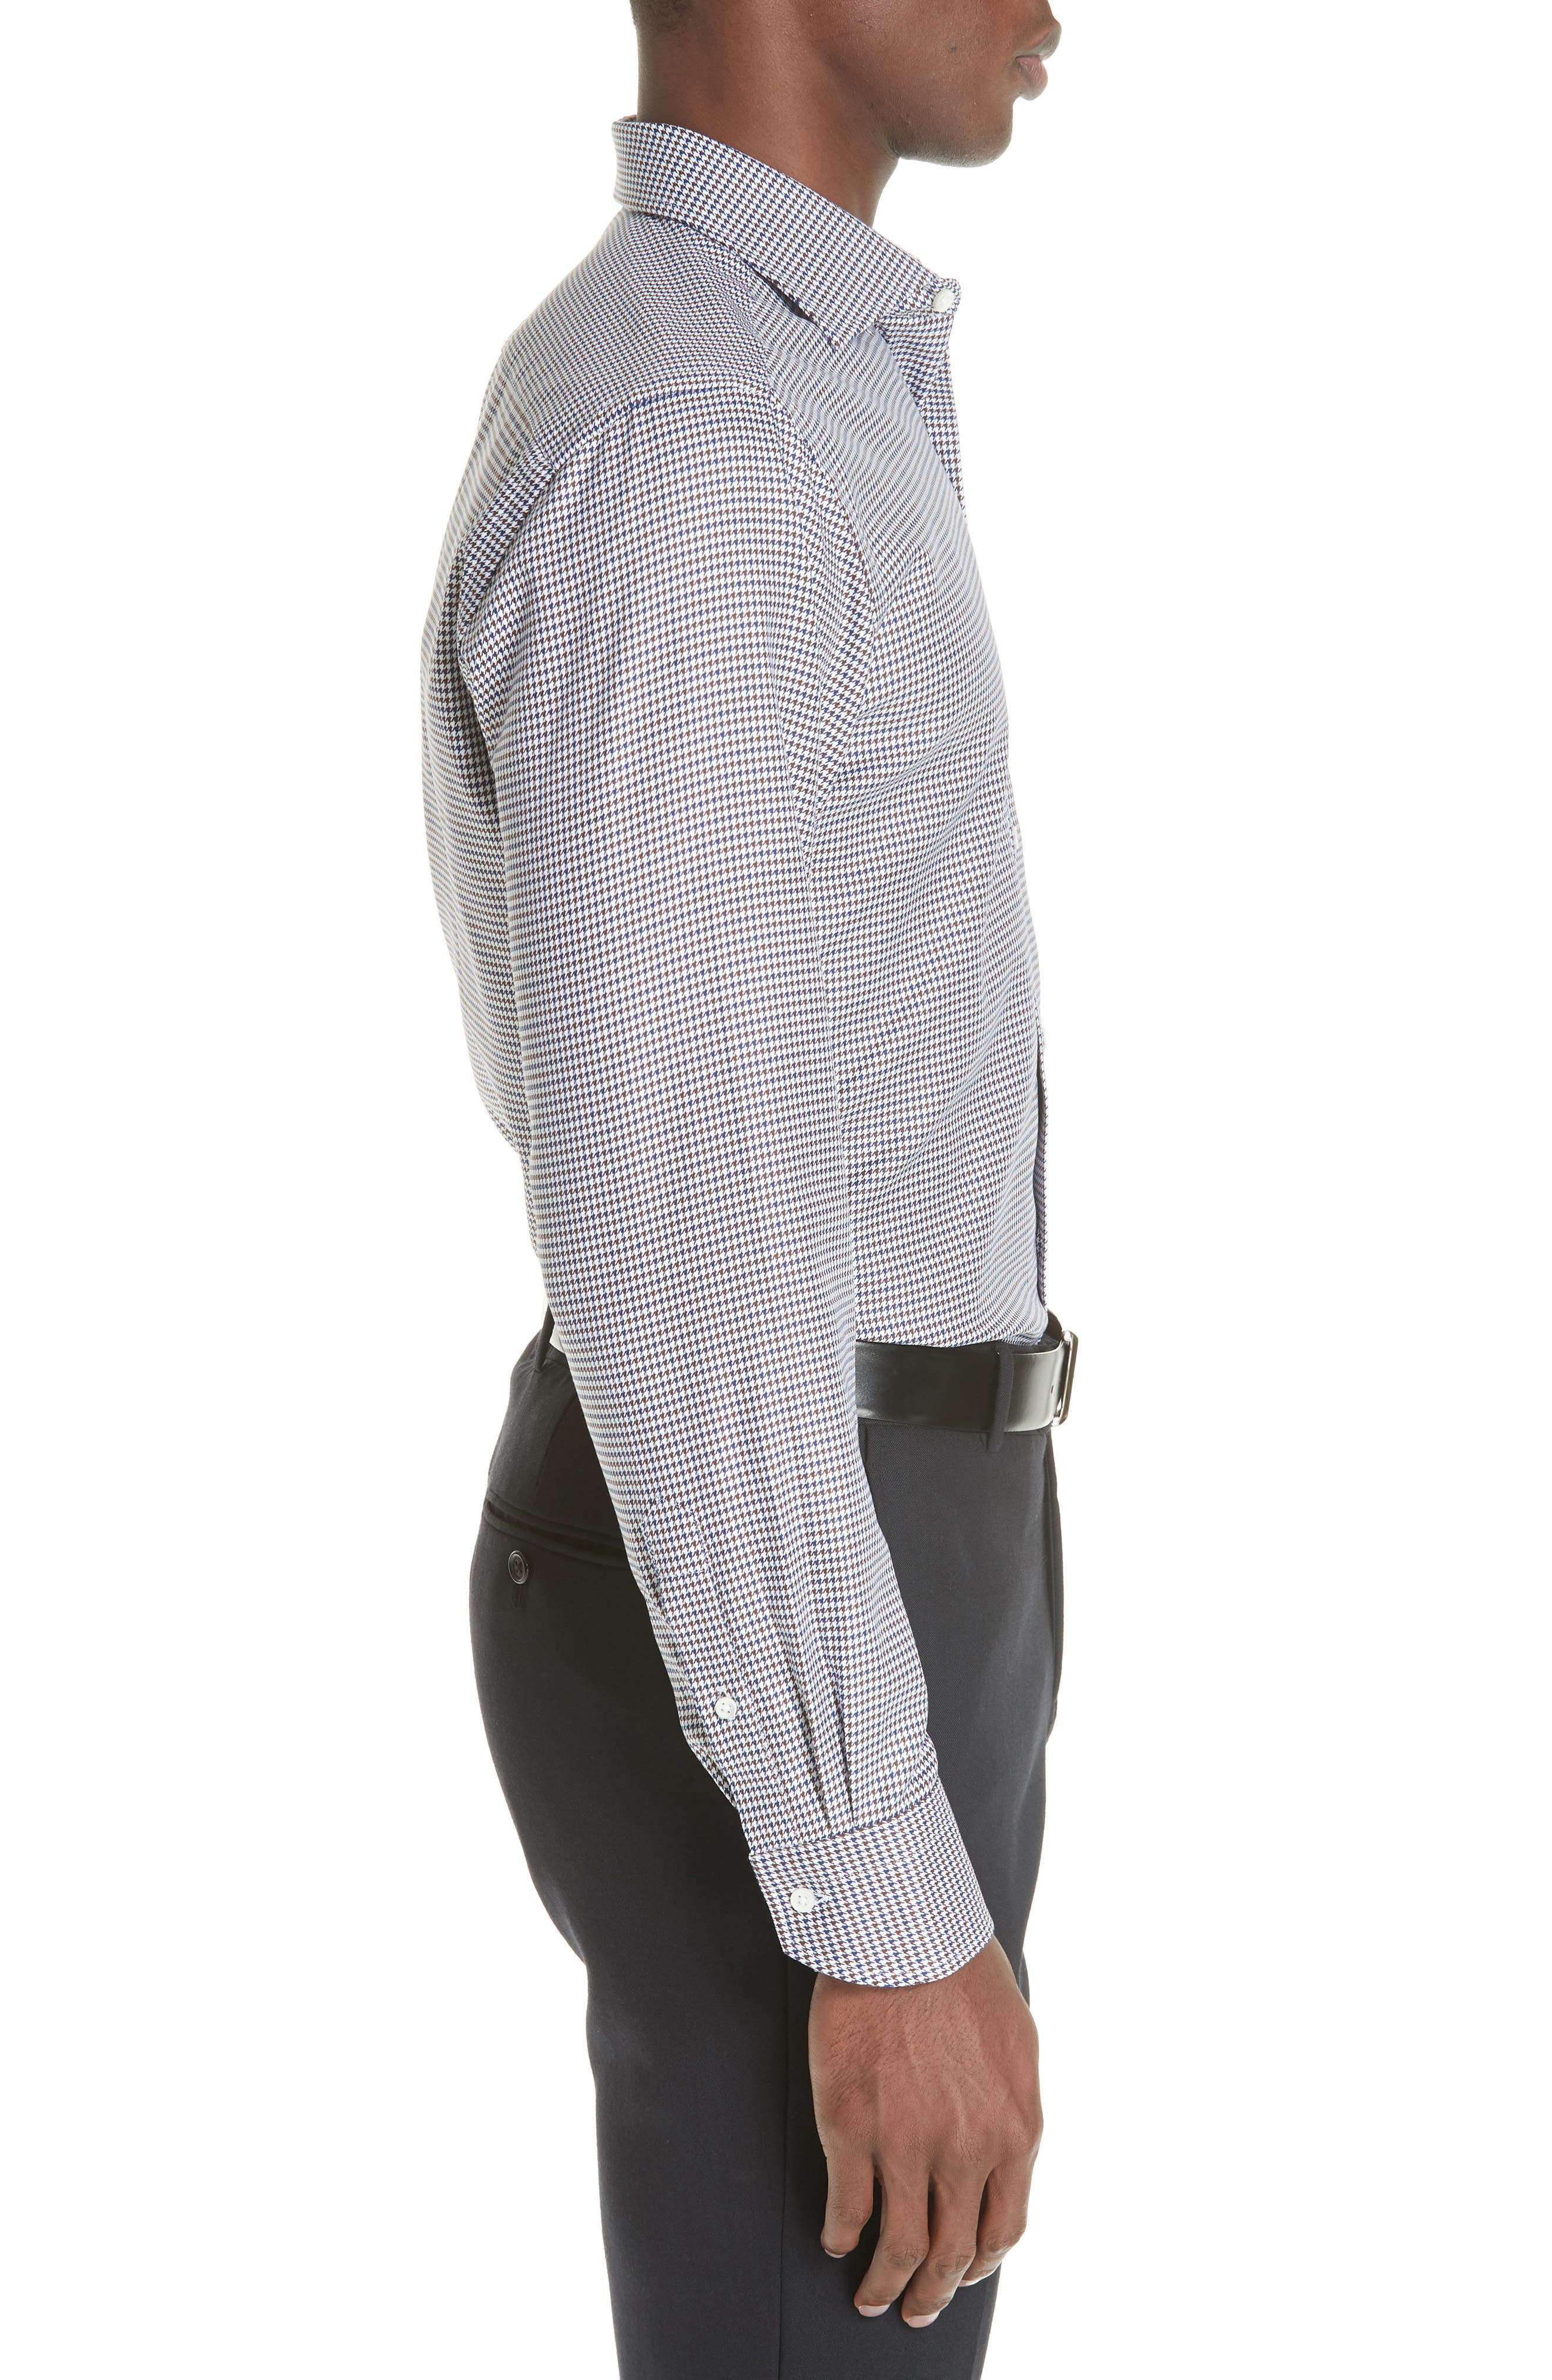 Regular Fit Houndstooth Dress Shirt,                             Alternate thumbnail 4, color,                             NAVY/ BROWN